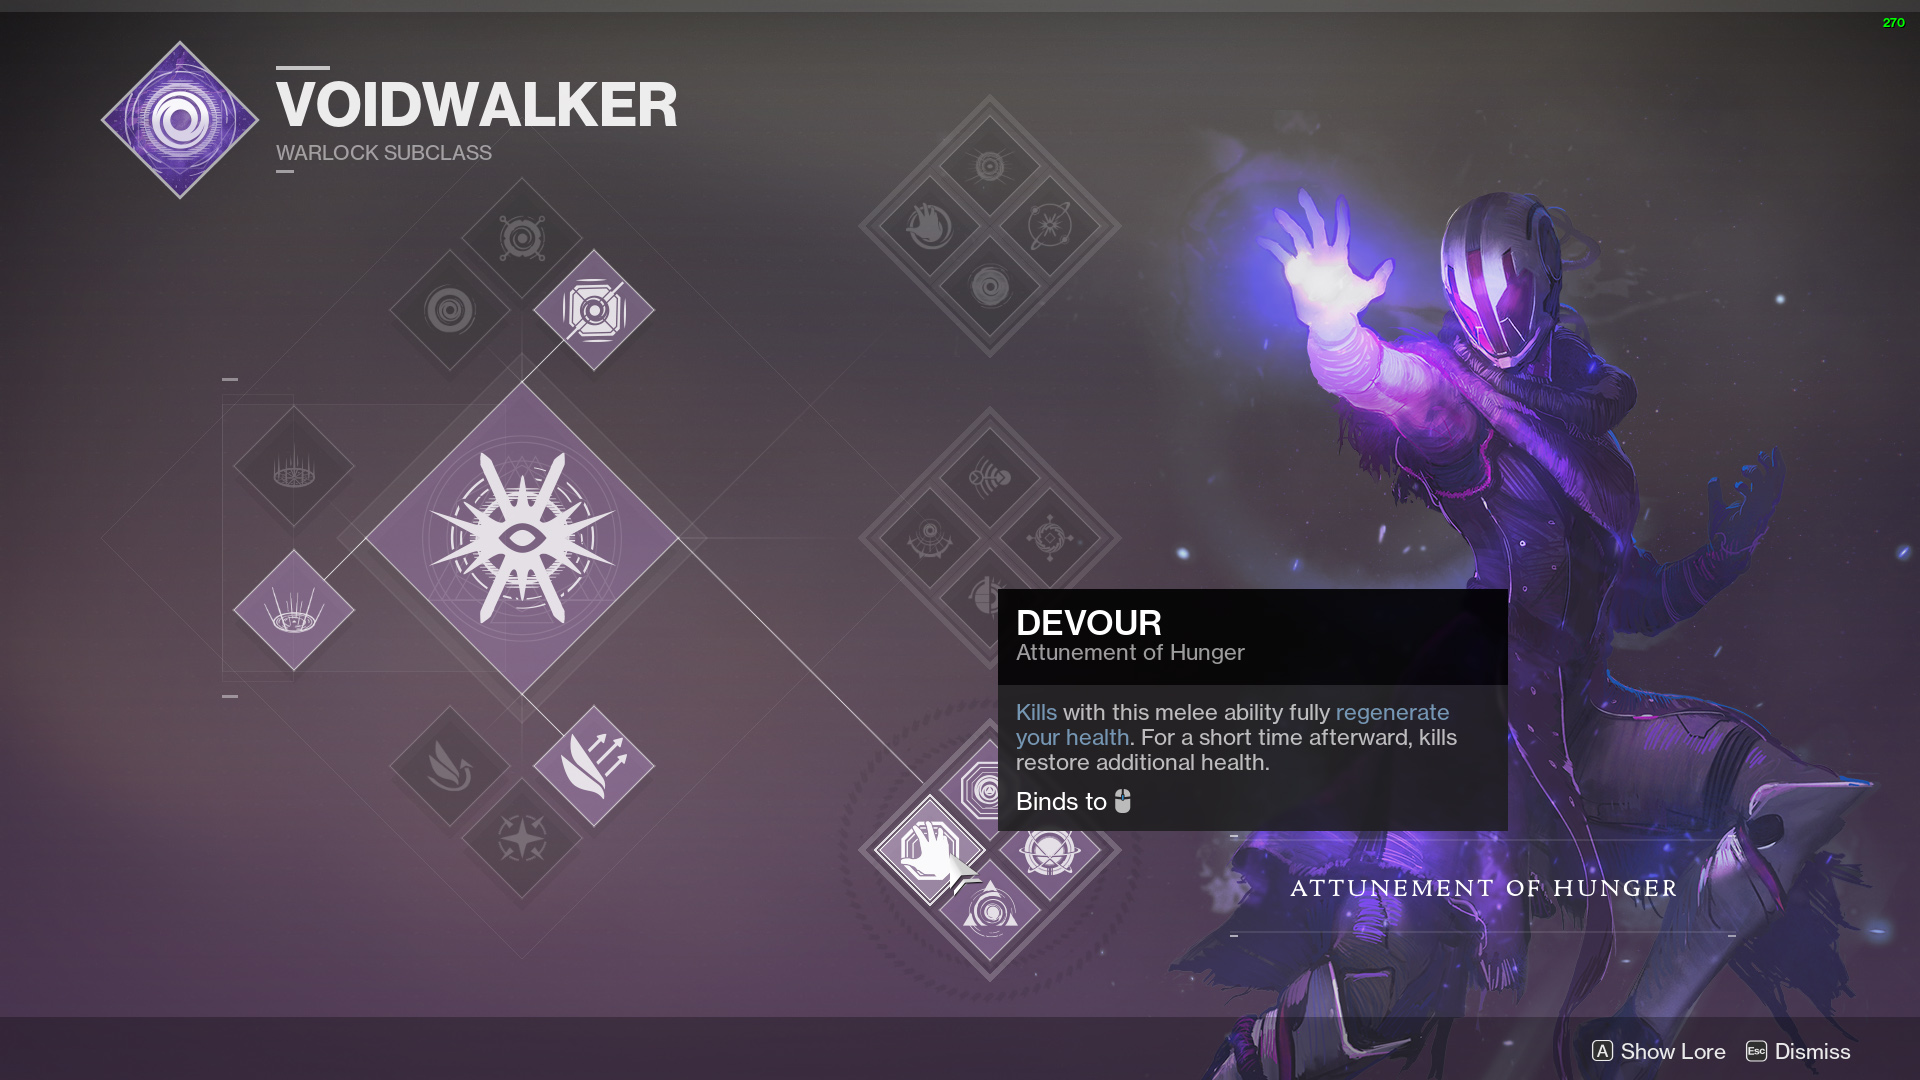 destiny 2 voidwalker devour